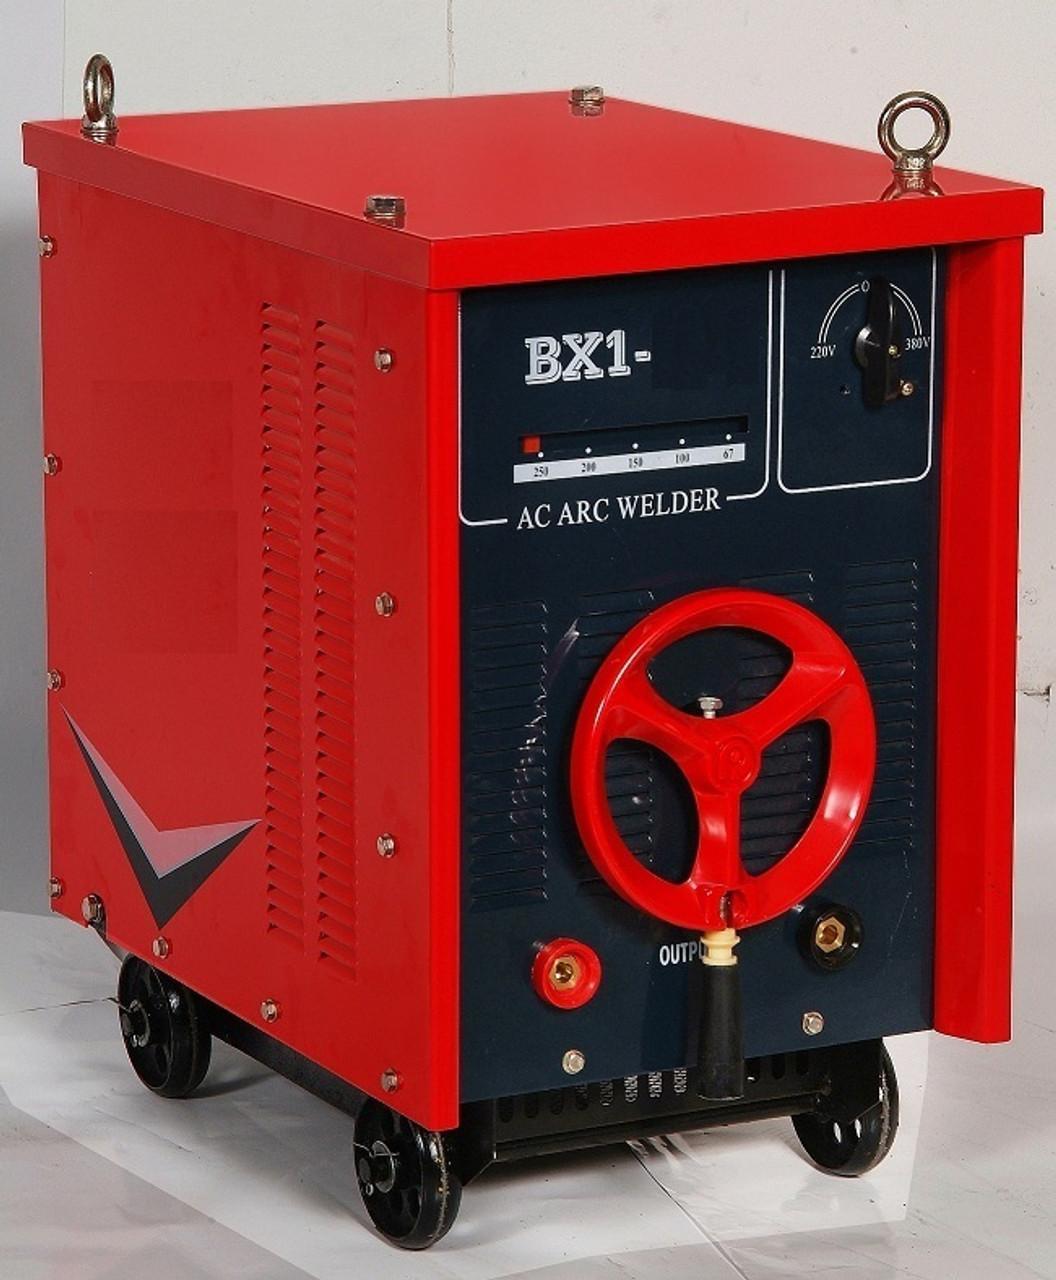 power flex welding machine single phase 250 amps ac arc welder gz nigeria [ 1056 x 1280 Pixel ]